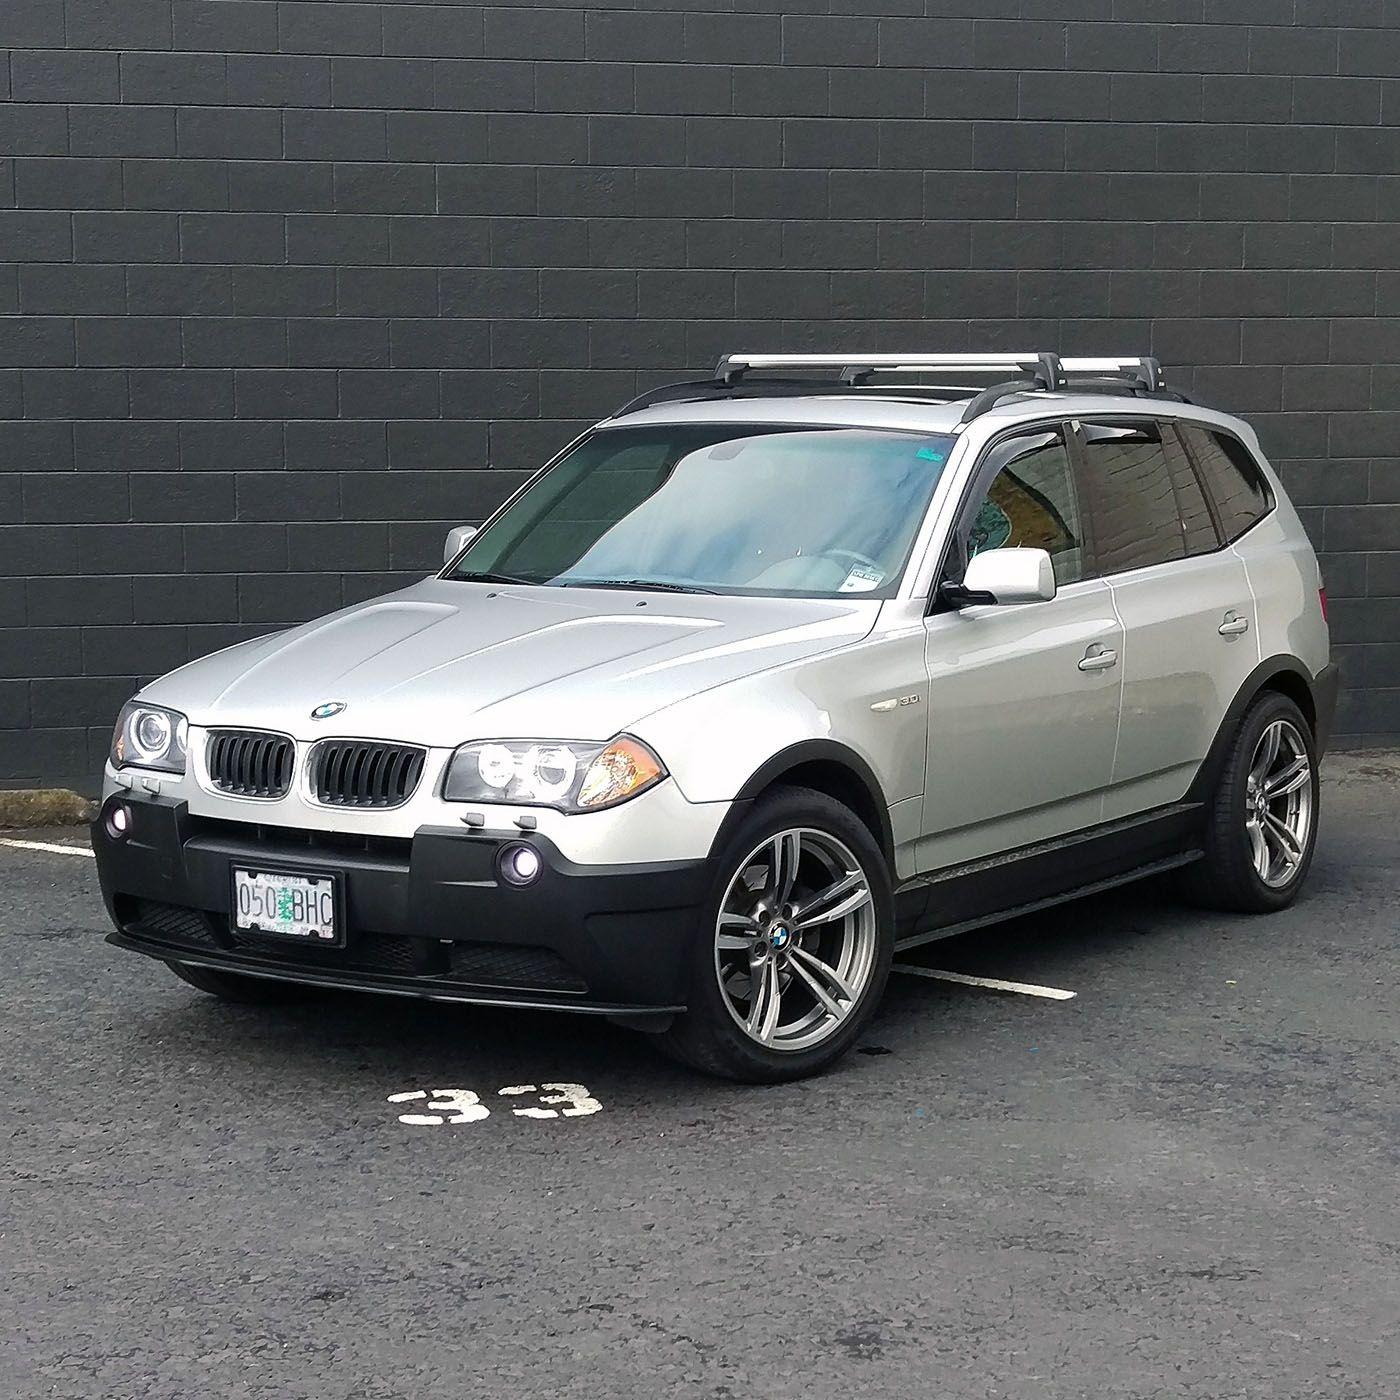 Berühmt 2004 E83 + OEM style 437m 19's + mods - XBimmers | BMW X3 Forum &MY_29